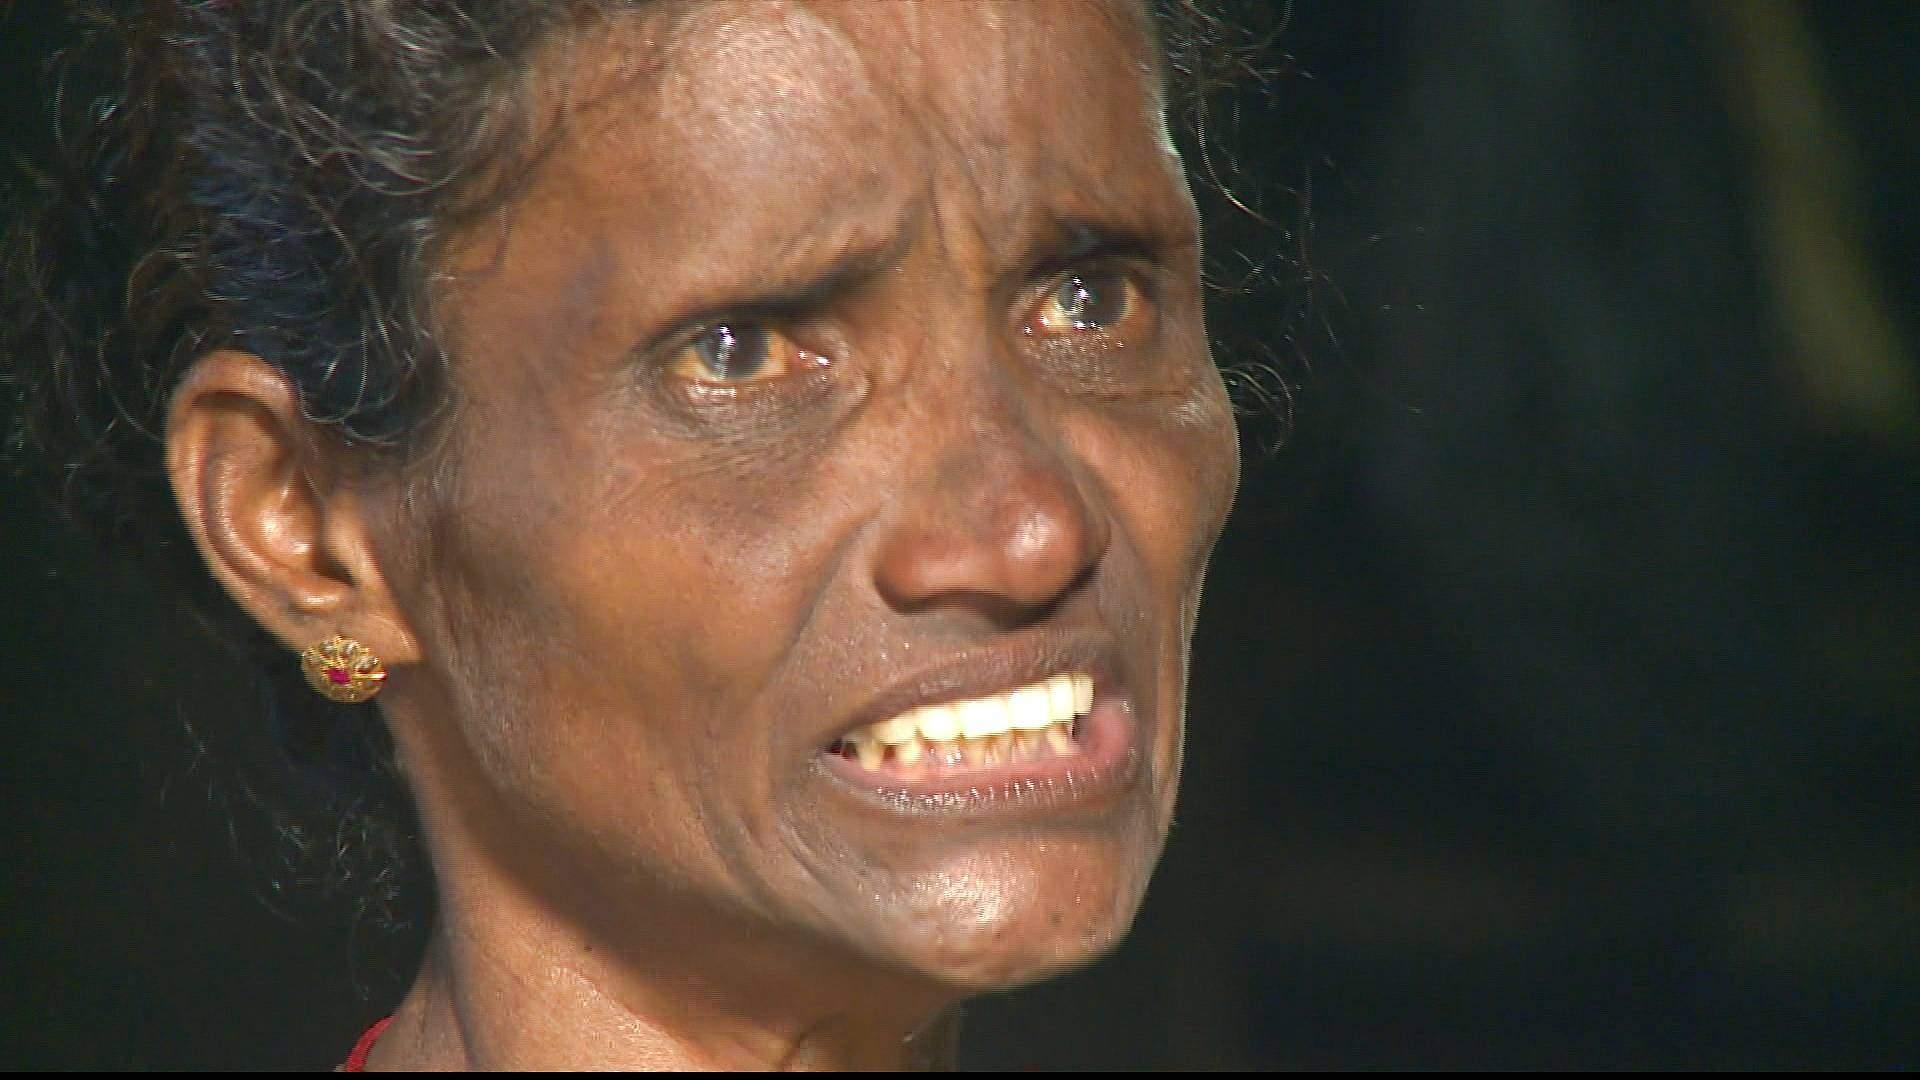 sri lanka election - photo #15